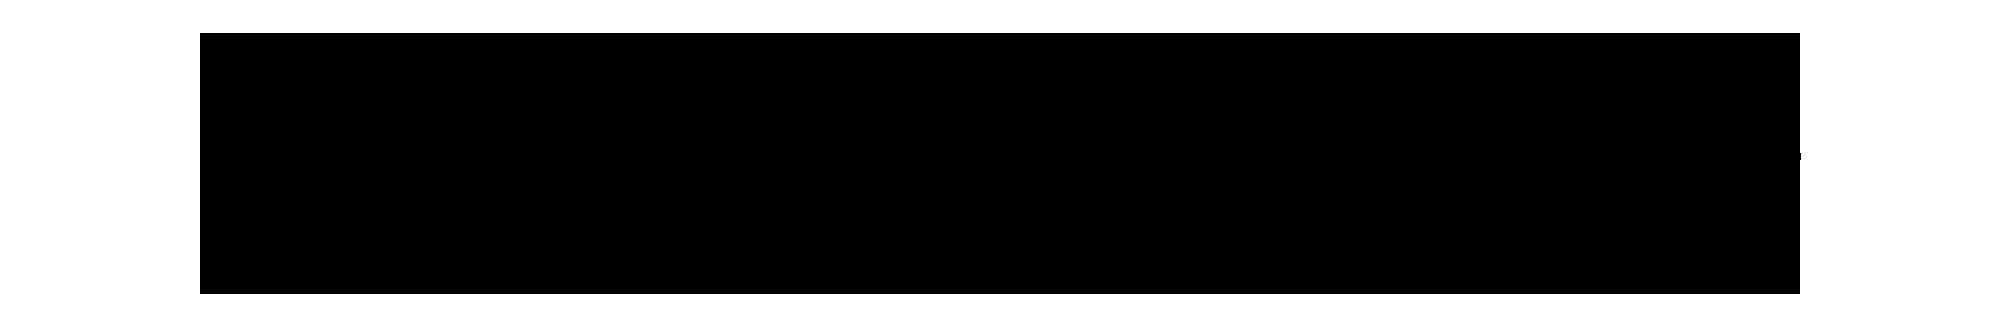 220 Below logo by Album Agency